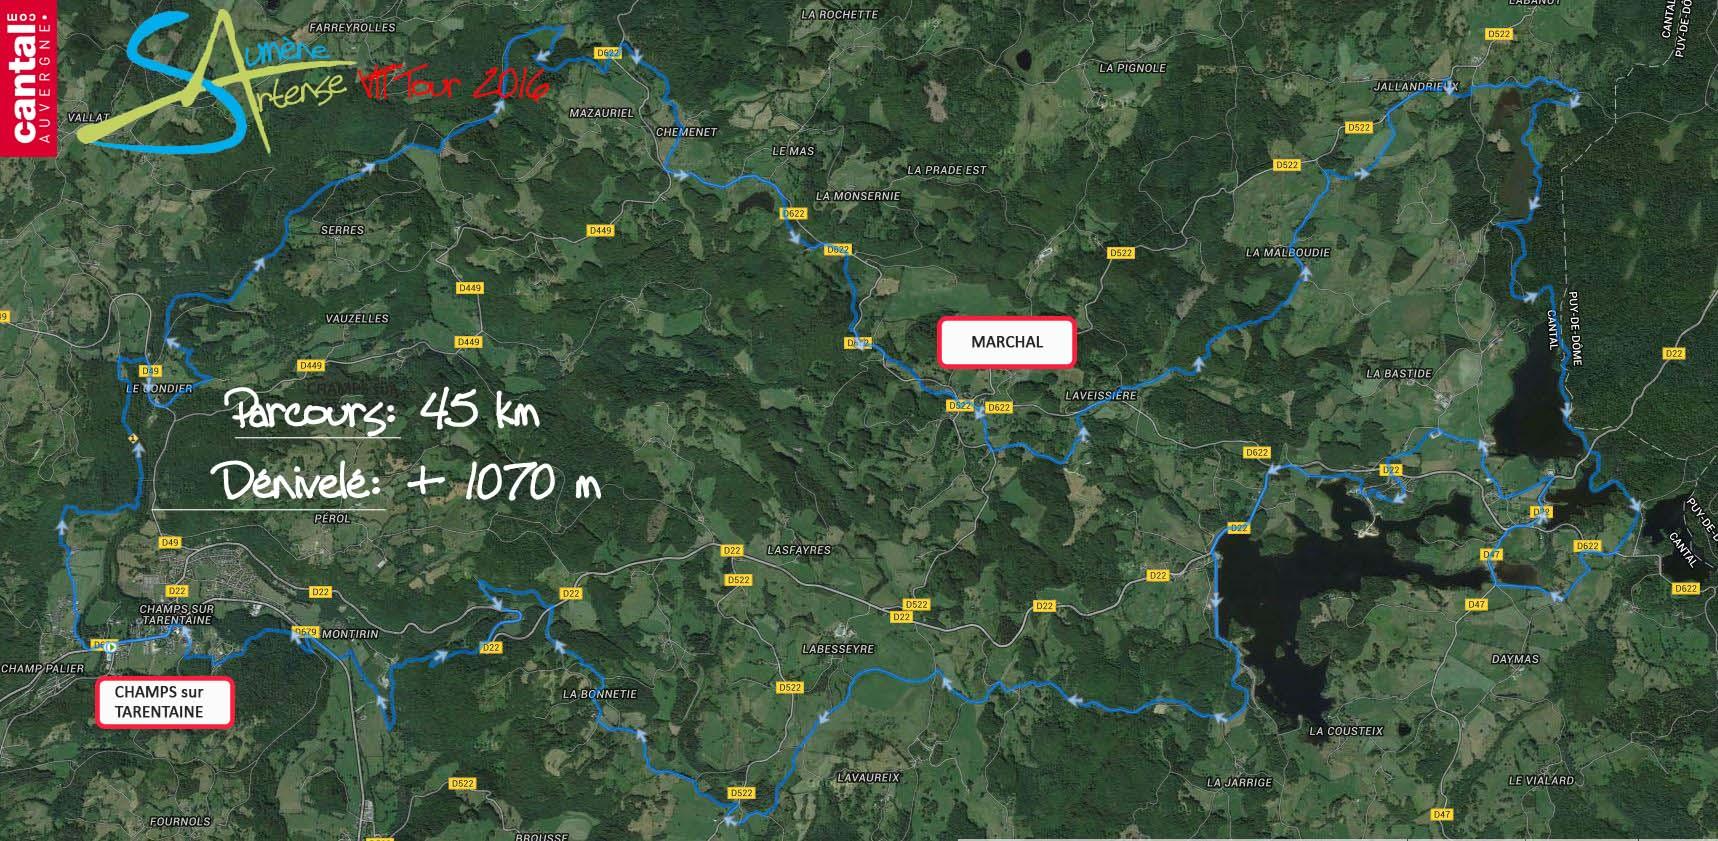 2016 savtt tour 45 km 1